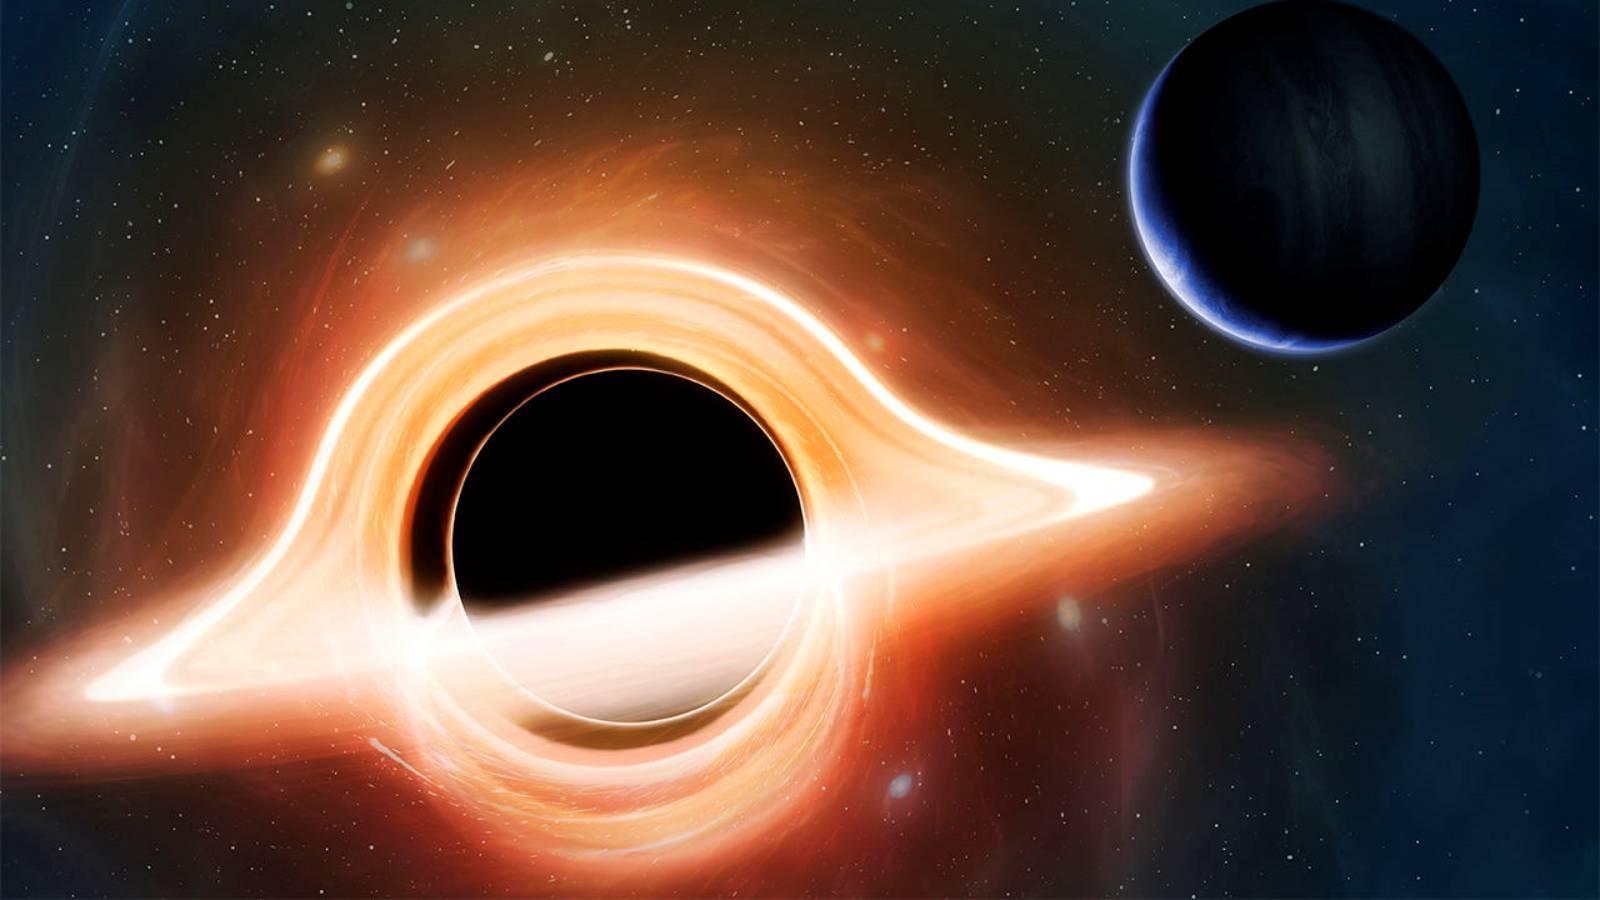 Black hole throwing